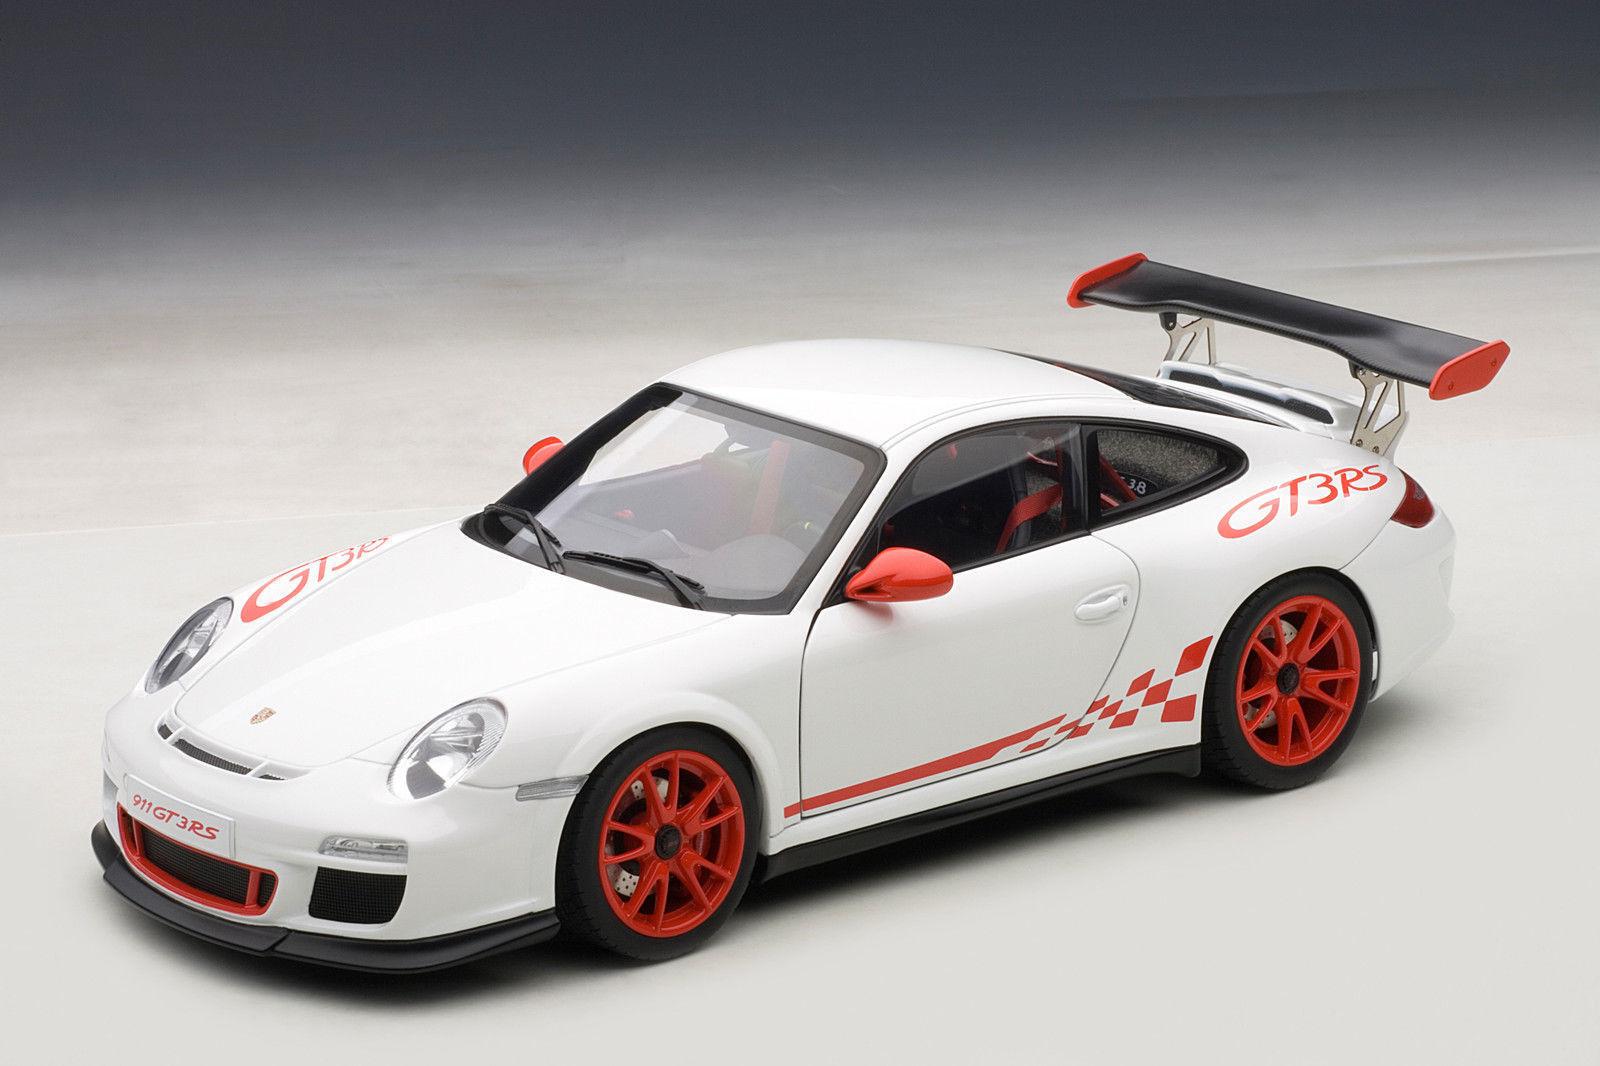 1 18 AUTOart PORSCHE 911 (997) GT3 RS 3.8 (WHITE RED STRIPES) 2010